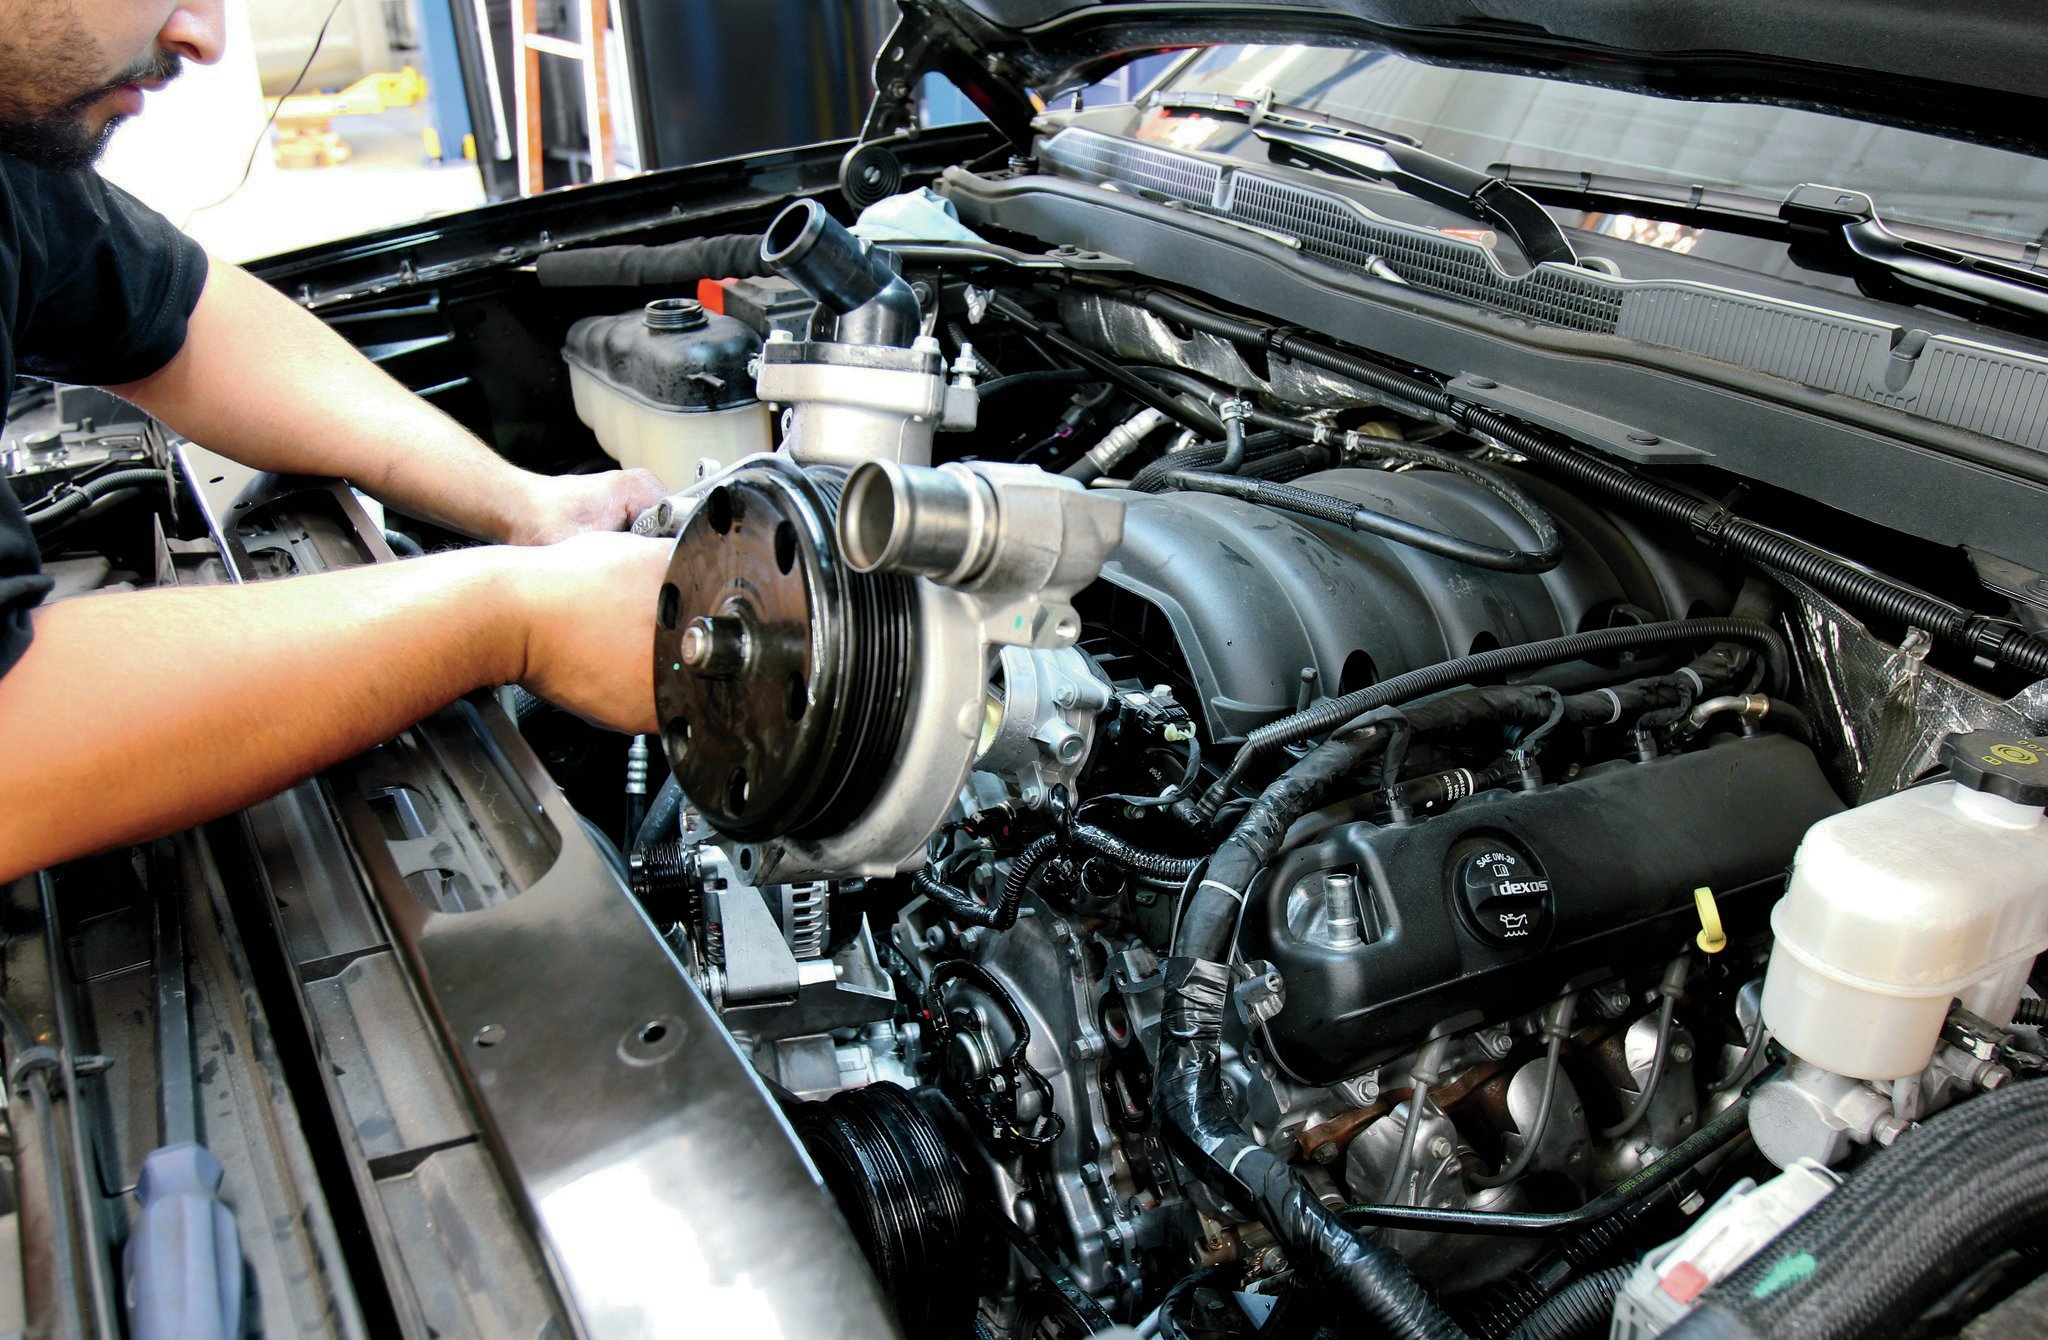 2014 Chevy LT1 COMP Cam Swap - Bigger Bumpstick Photo & Image Gallery